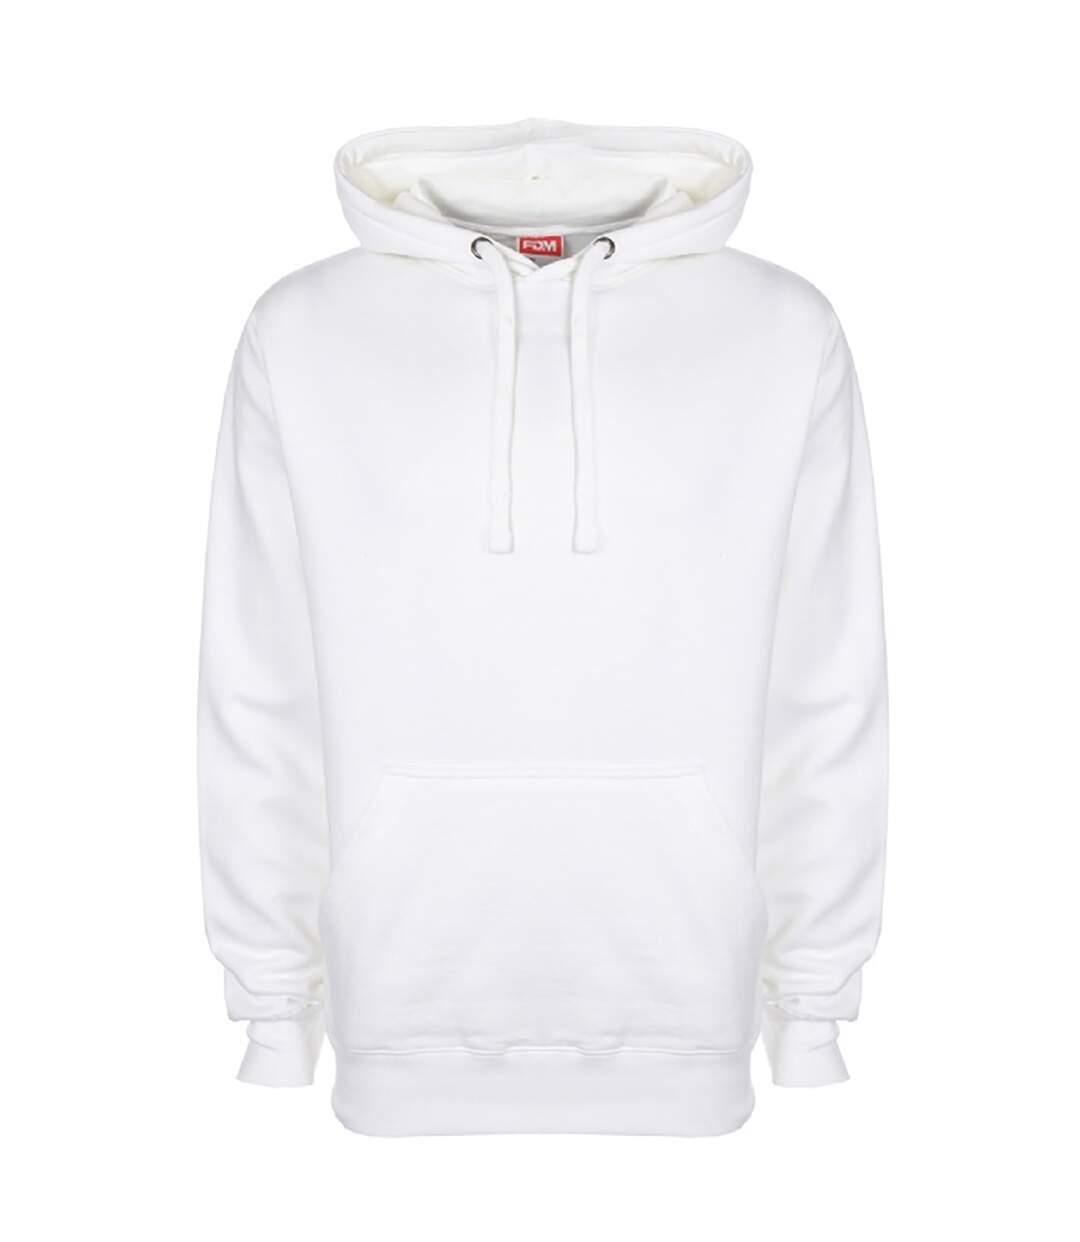 FDM Unisex Plain Original Hooded Sweatshirt / Hoodie (300 GSM) (White) - UTBC2024